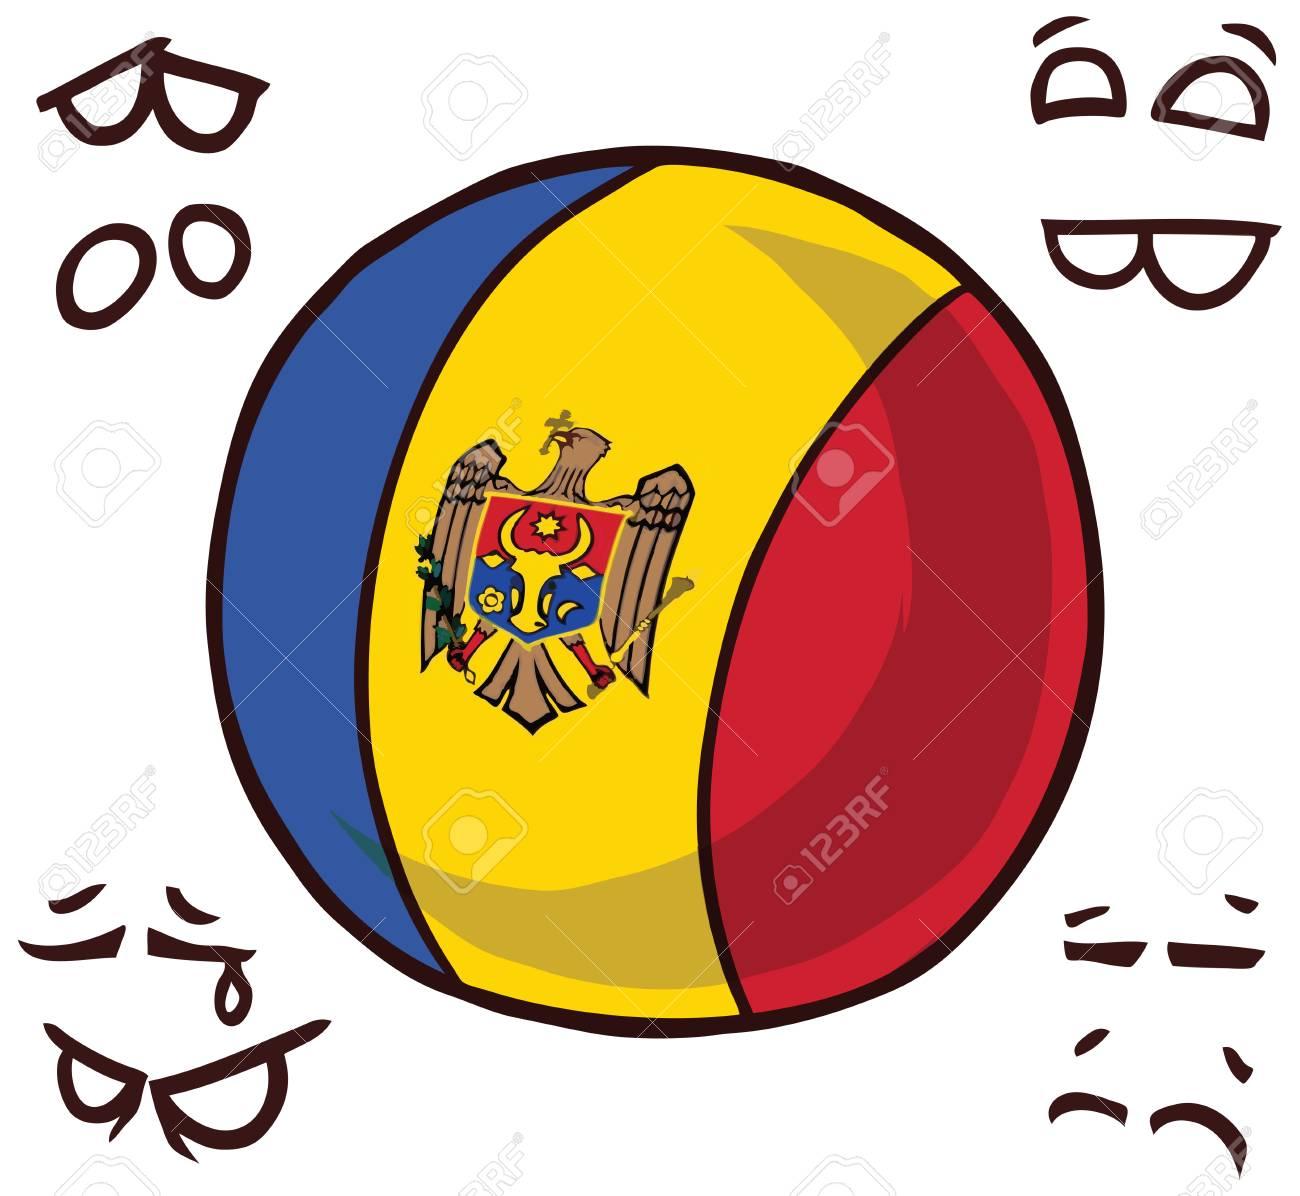 moldova country ball - 110723169